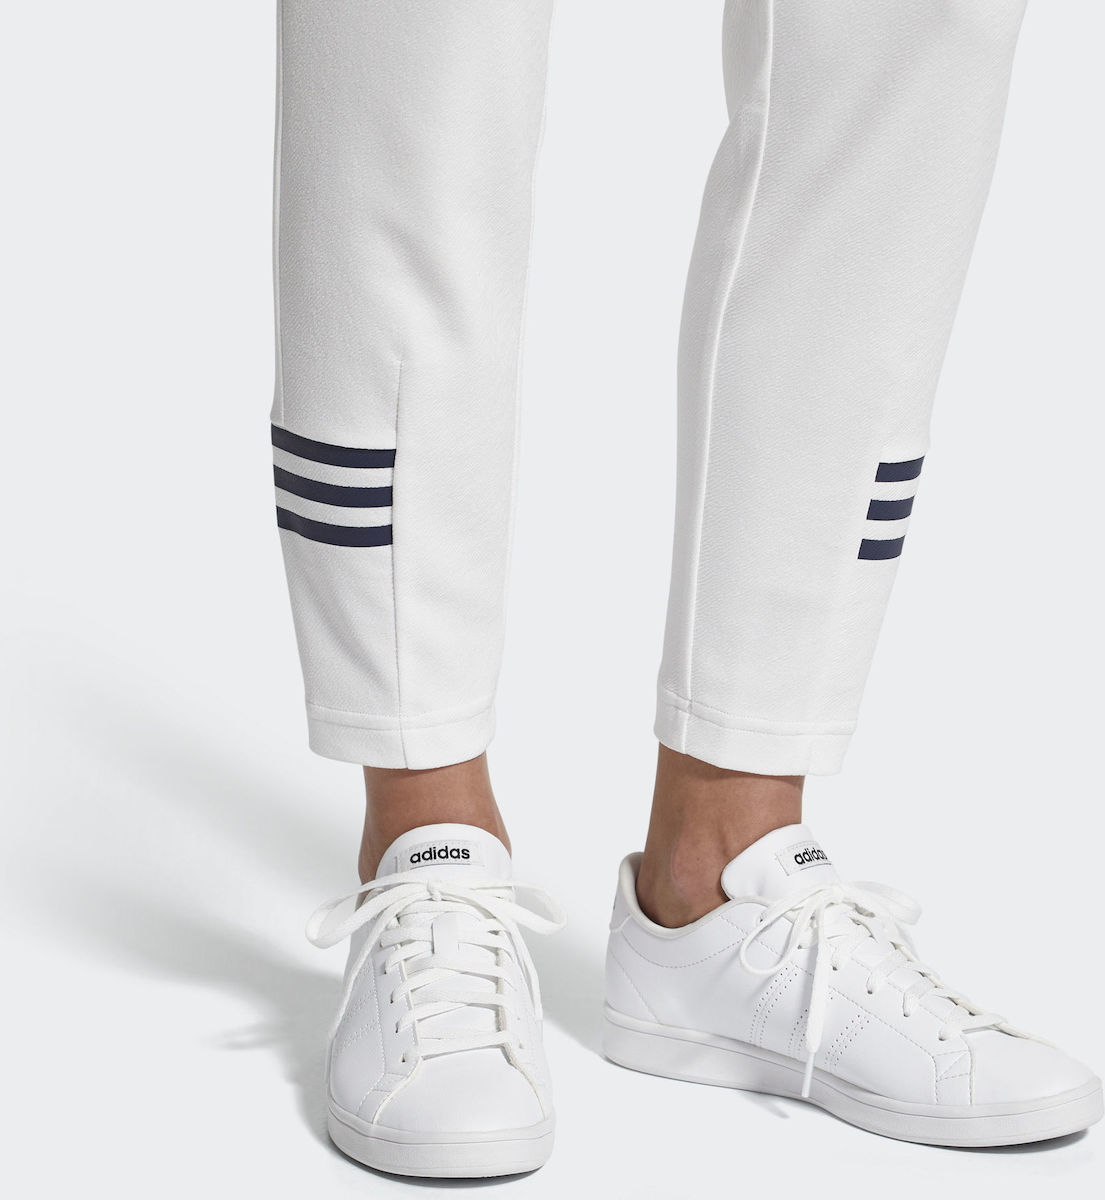 online store a52ff 75e79 Adidas Advantage Clean QT B44667 ...